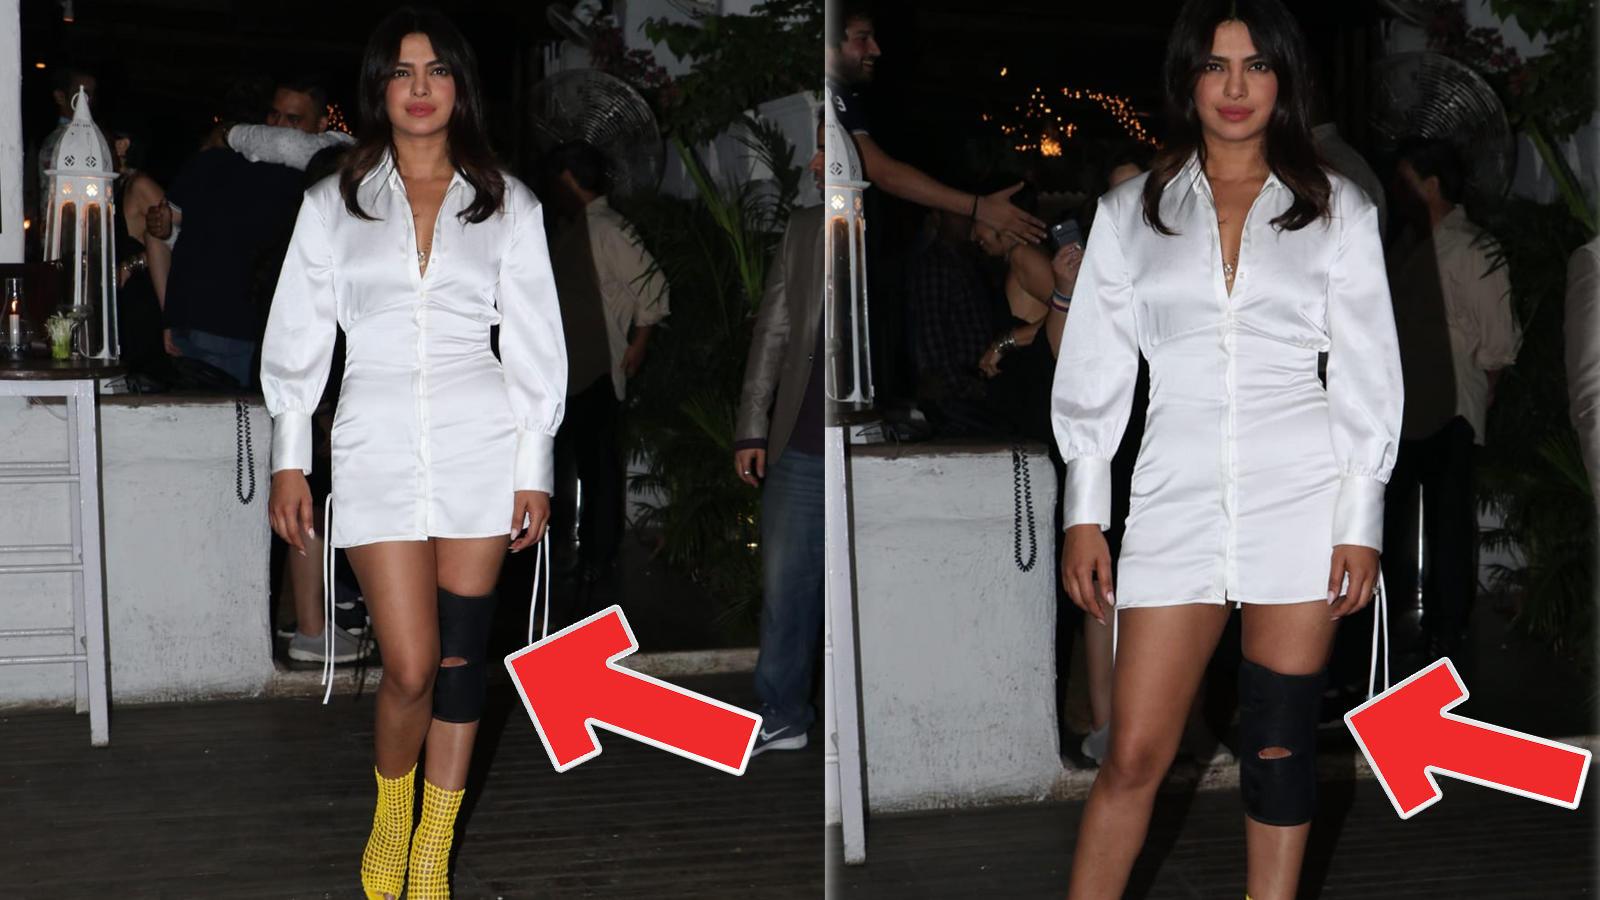 17f2dba758 Priyanka Chopra spotted with a knee brace, fans get worried if she's injured